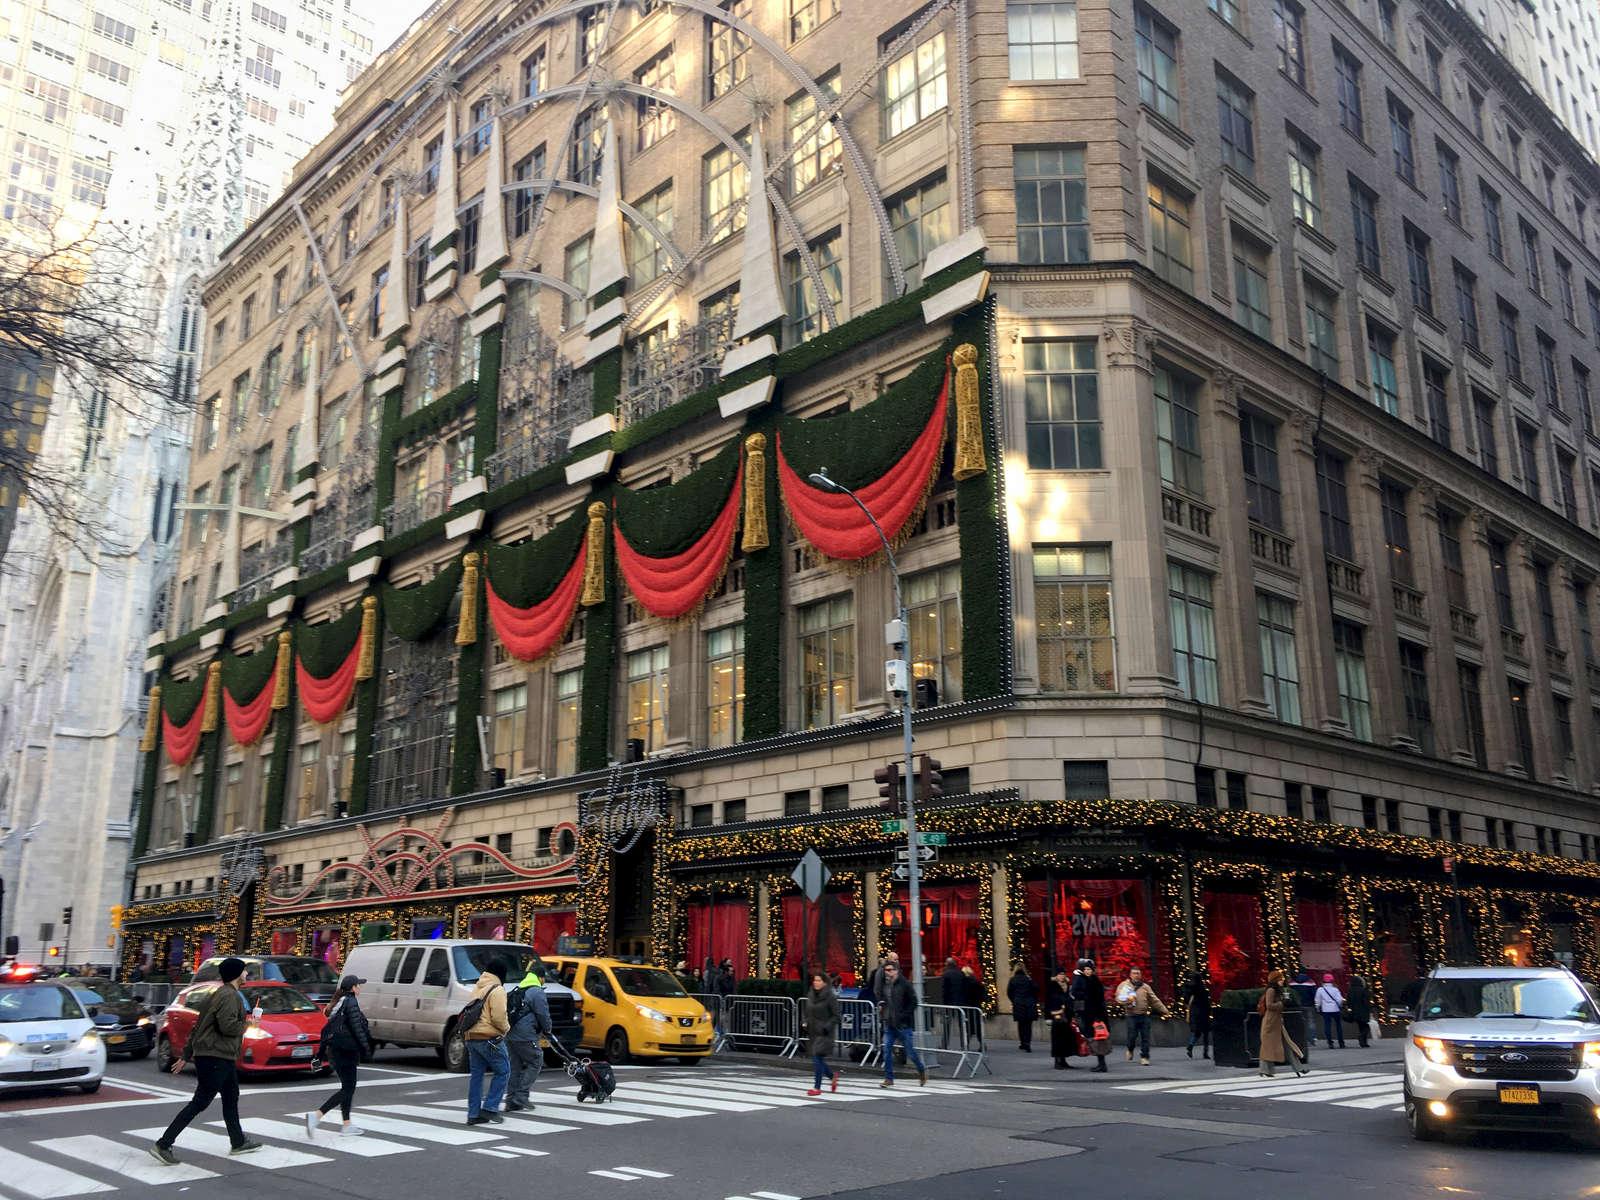 Saks Fifth Avenue store, NYC. Jon Chase photo